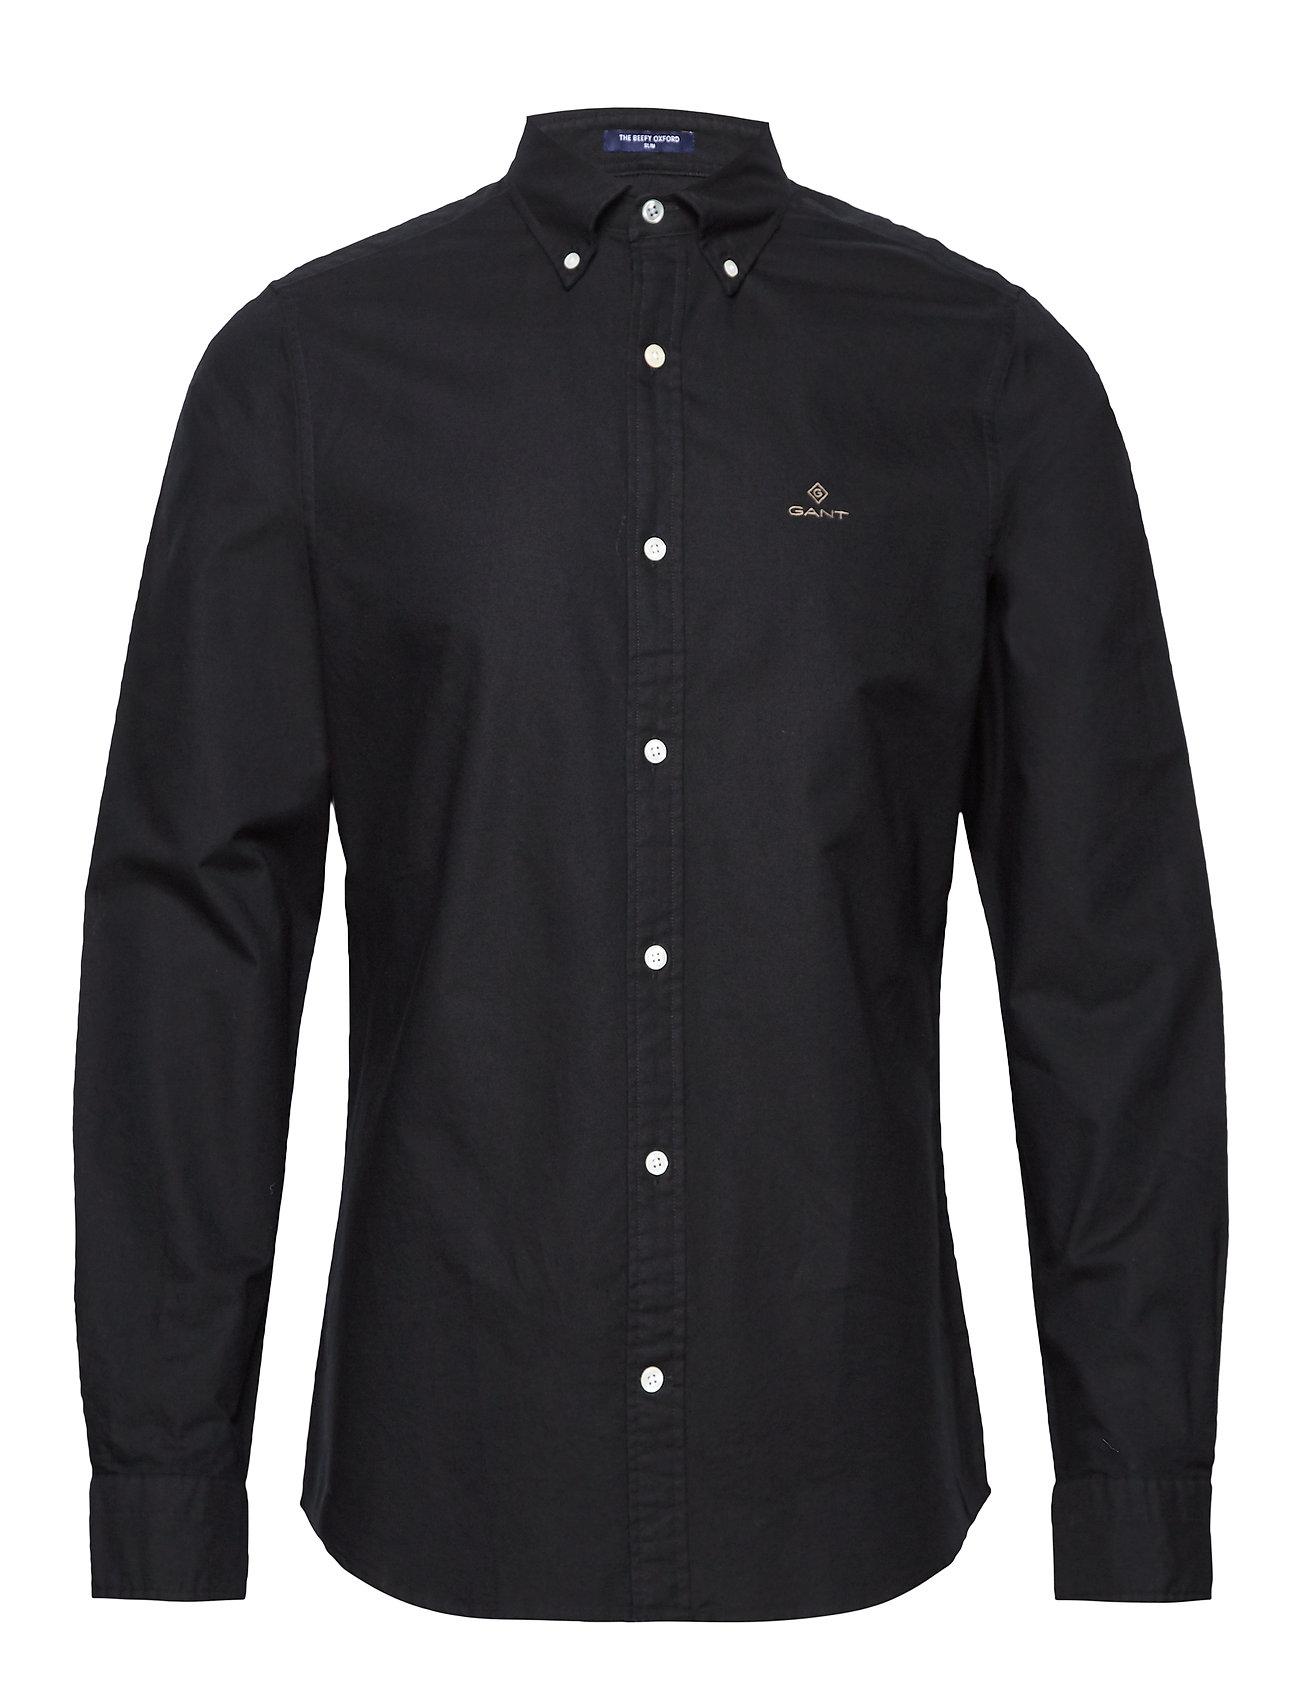 Gant THE BEEFY OXFORD SHIRT SLIM BD - BLACK